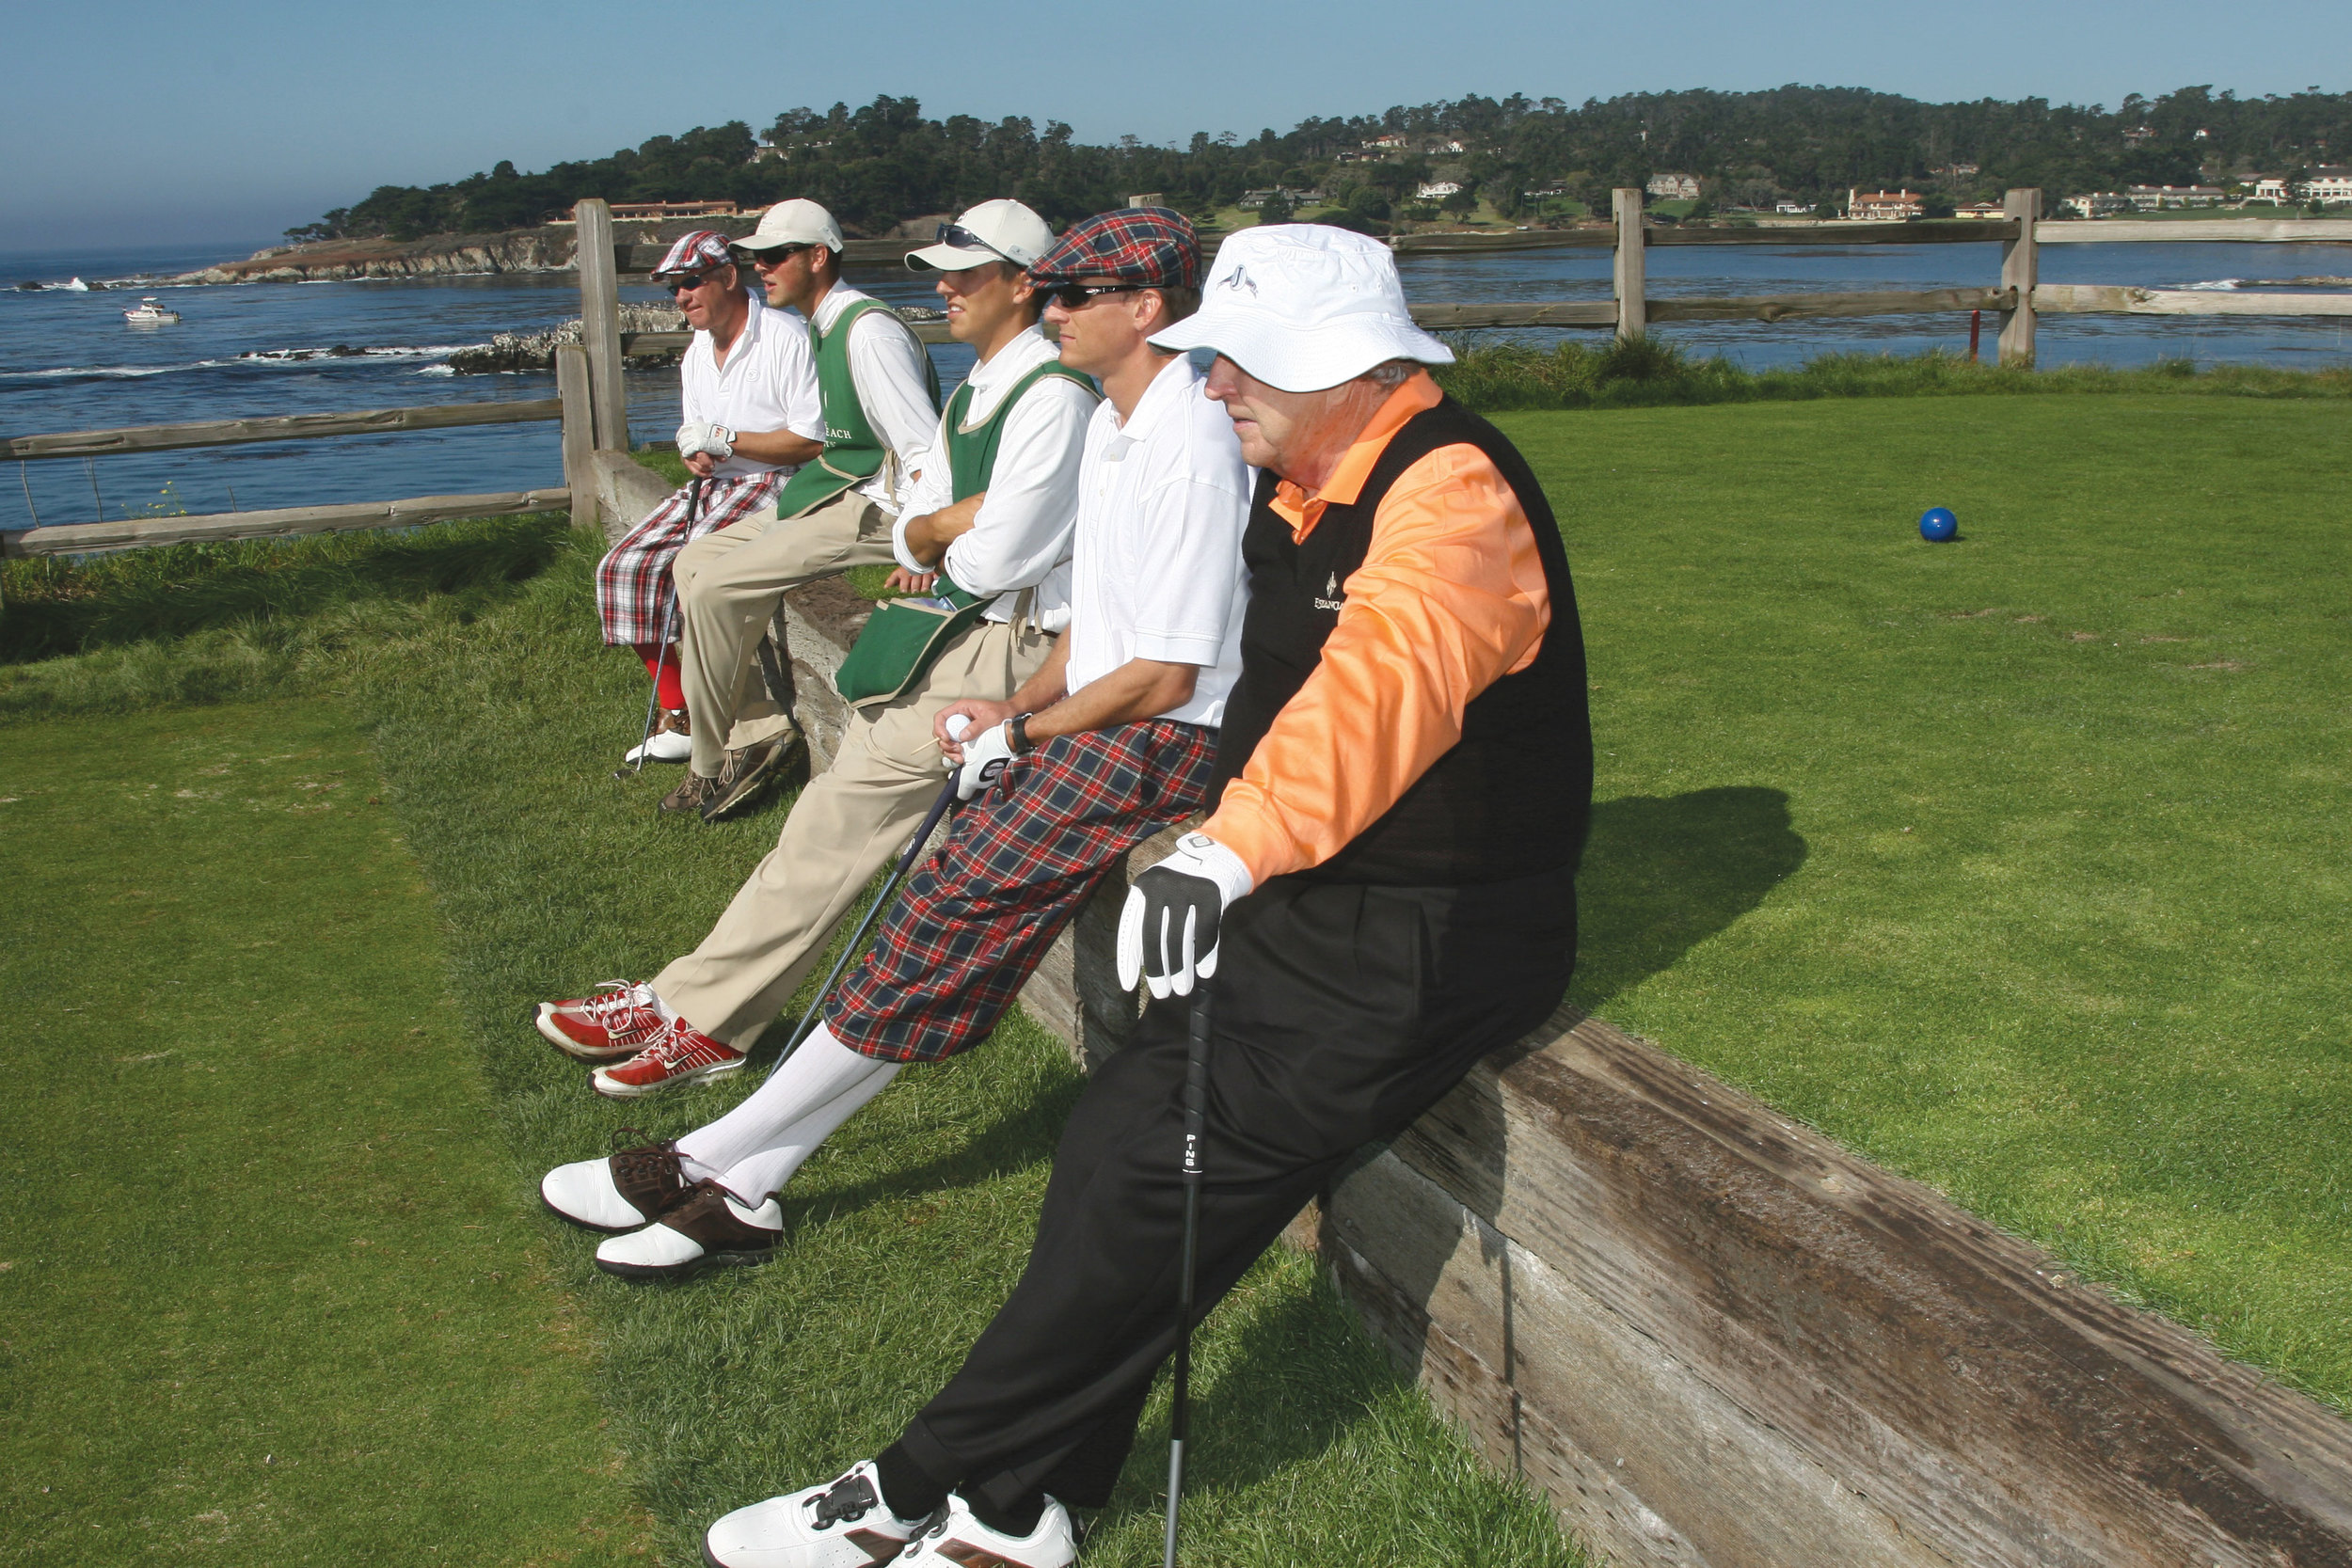 Pebble-Golf-10-13-07-F-106-copy.jpg